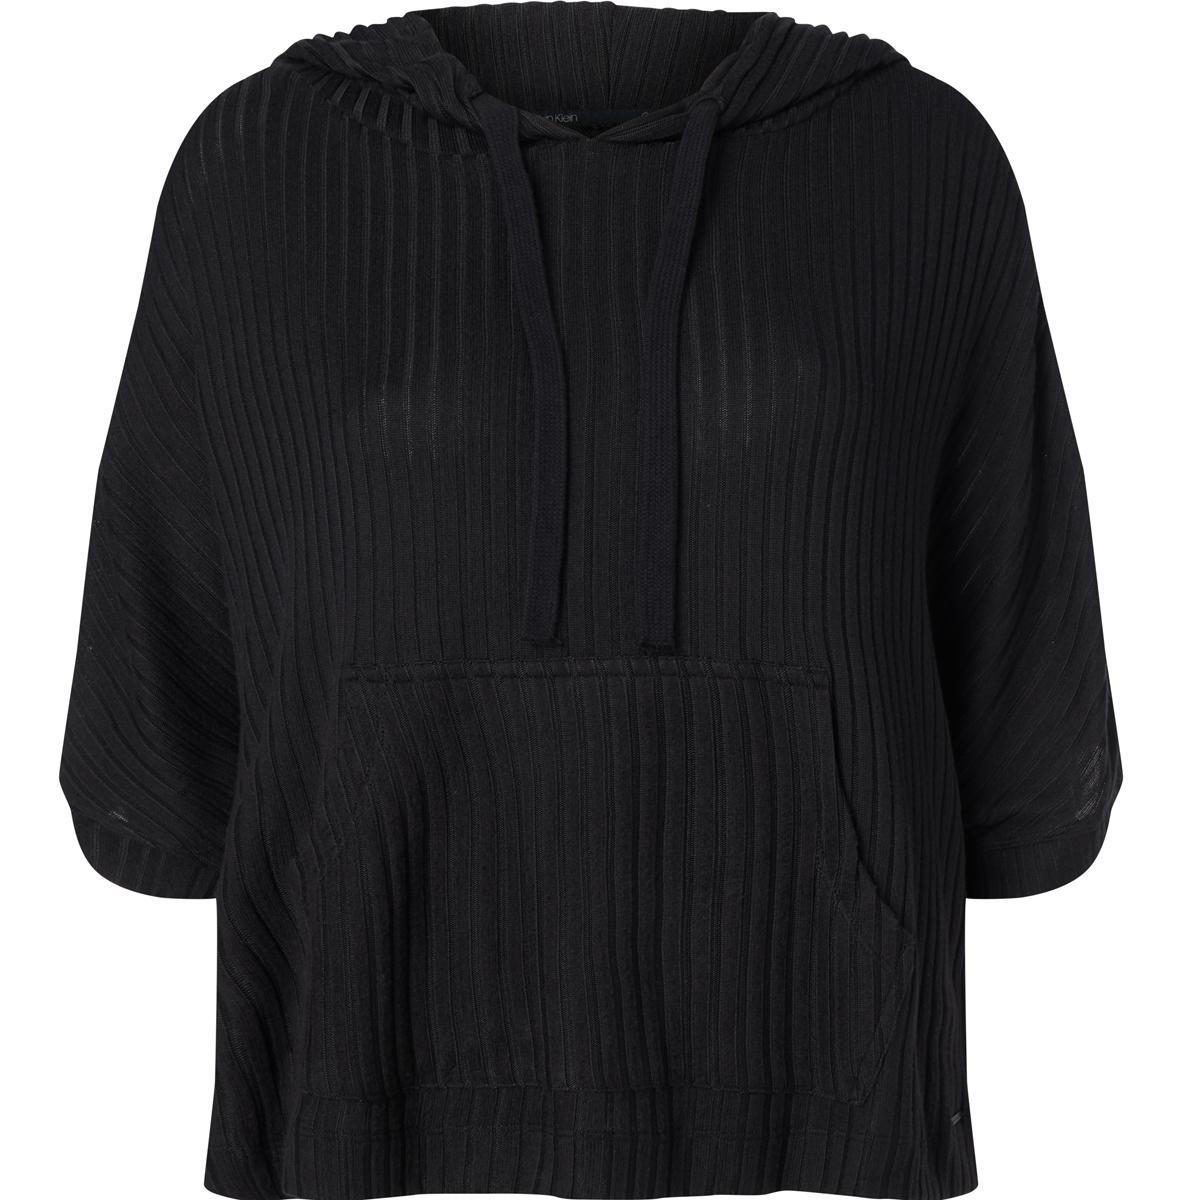 Sweat à capuche noir - Calvin Klein Underwear - Modalova